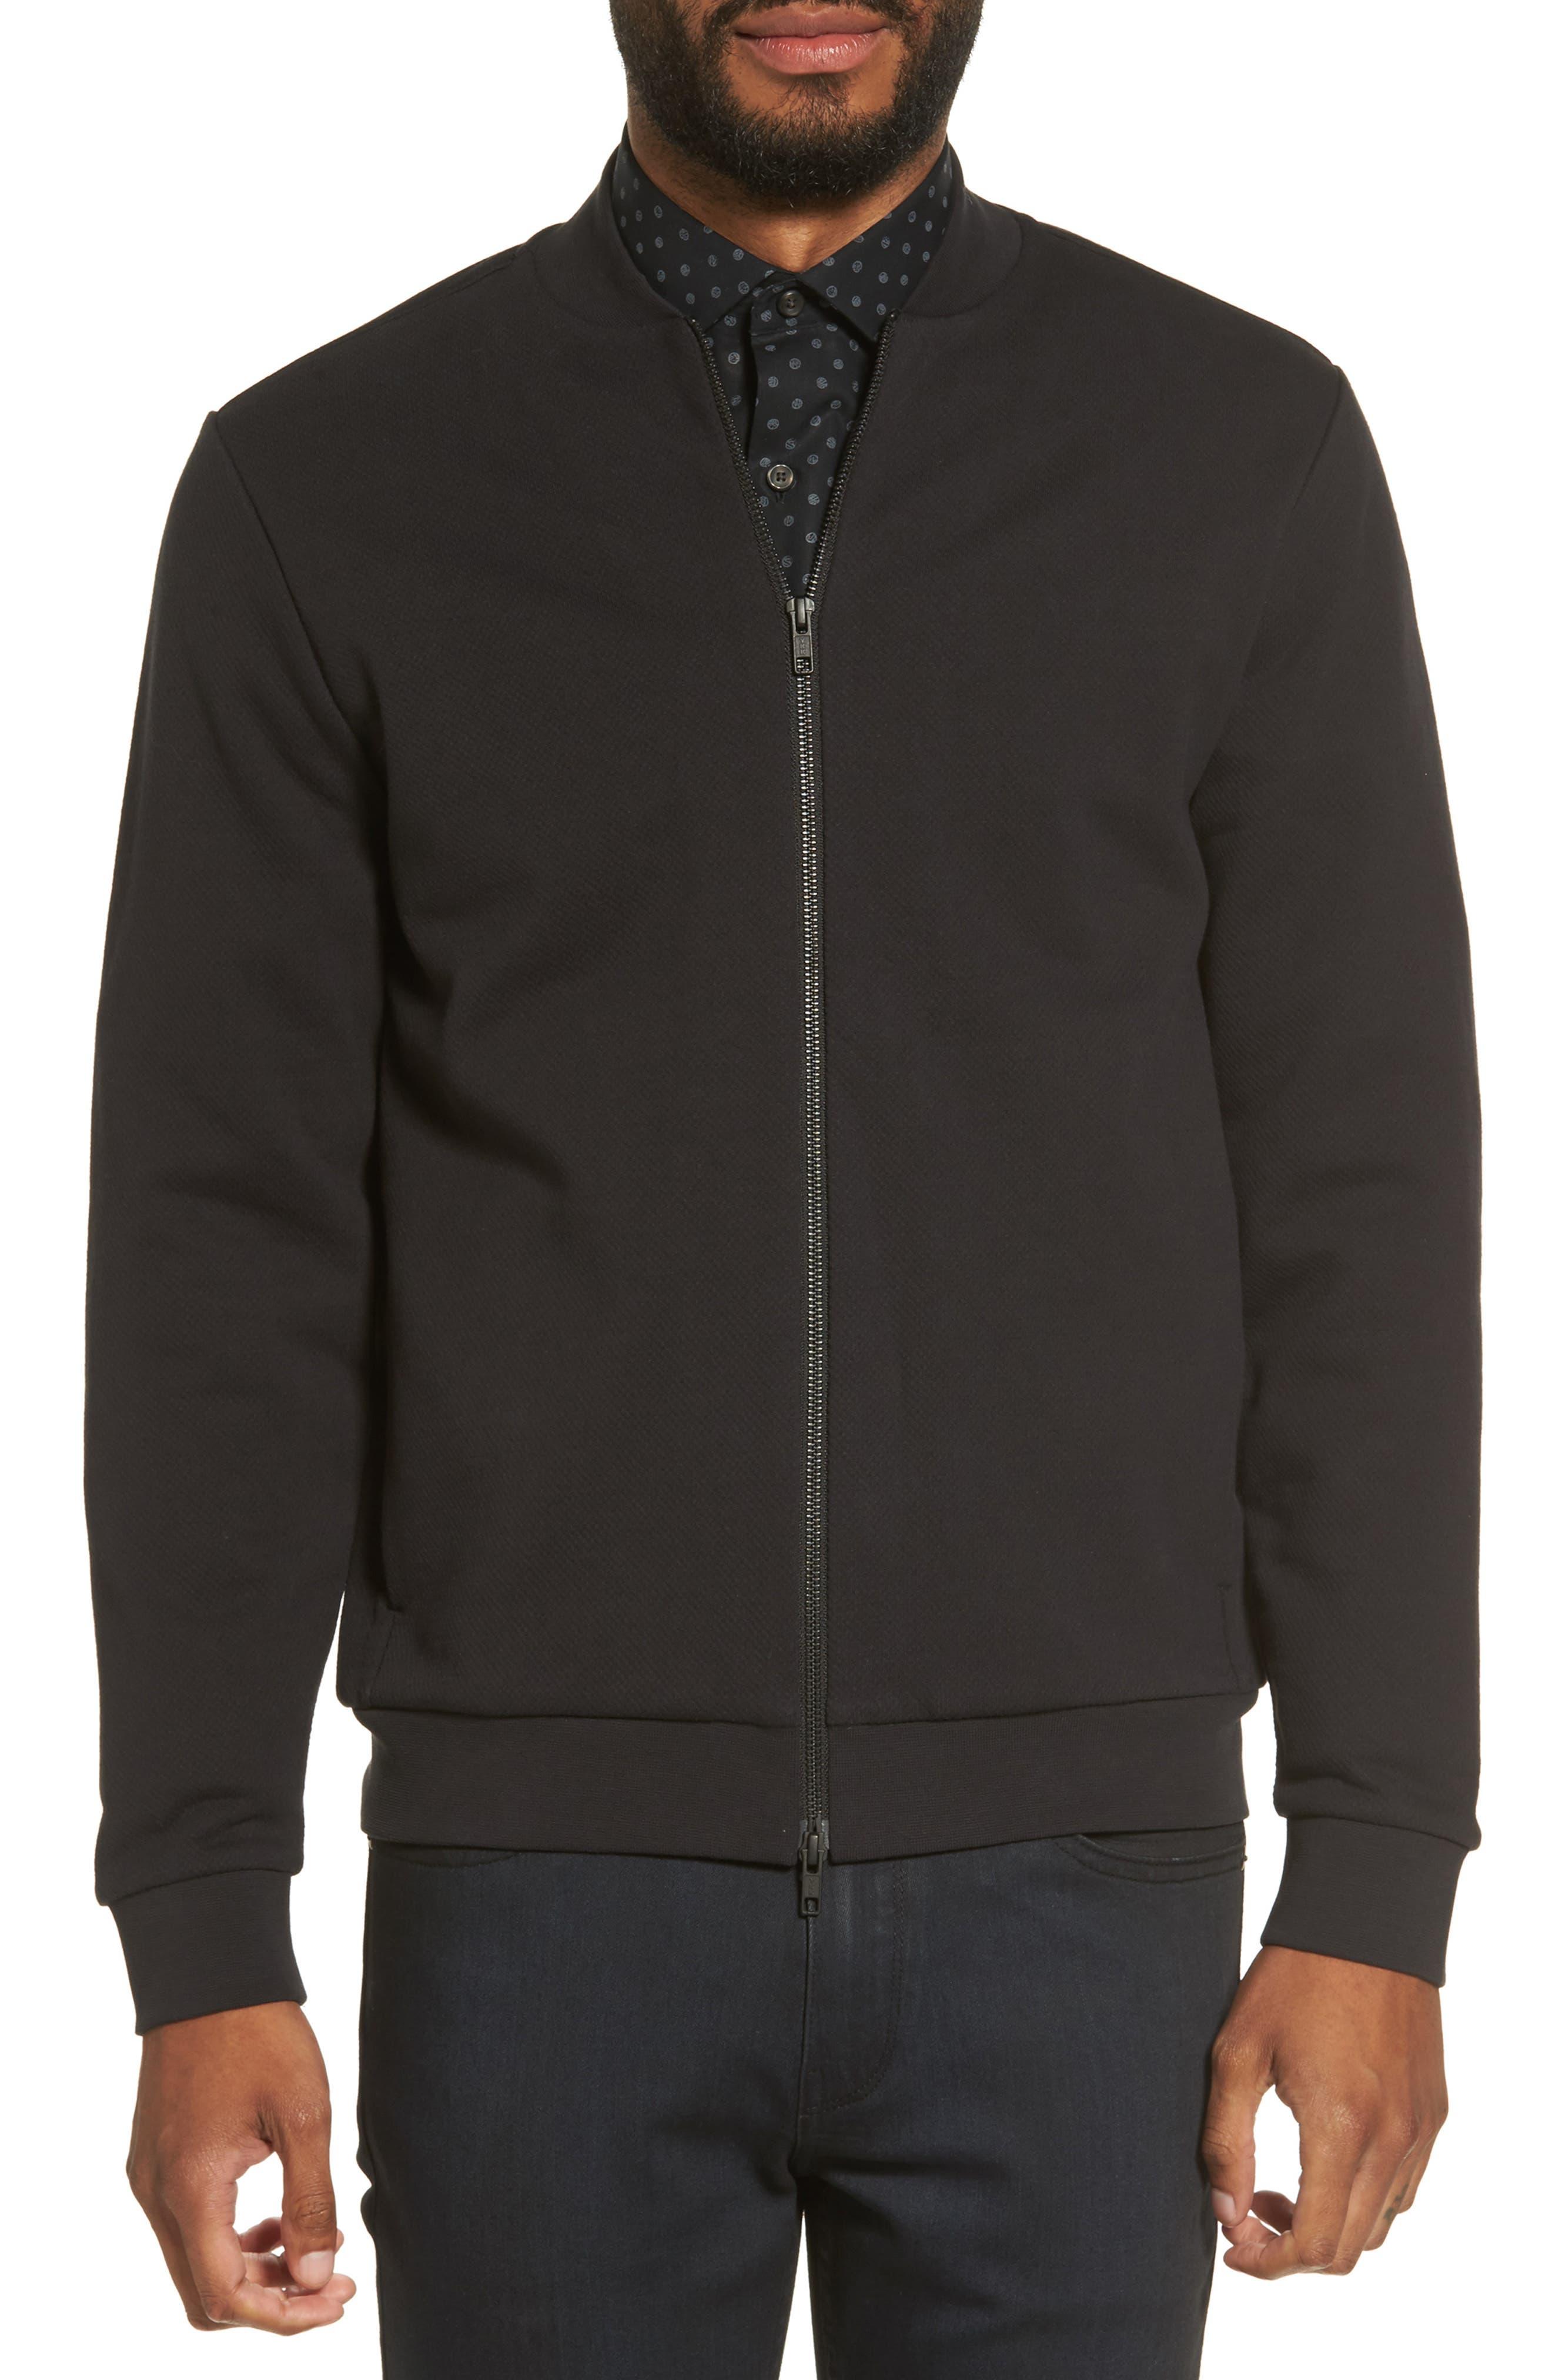 Main Image - Calibrate Zip Fleece Bomber Jacket